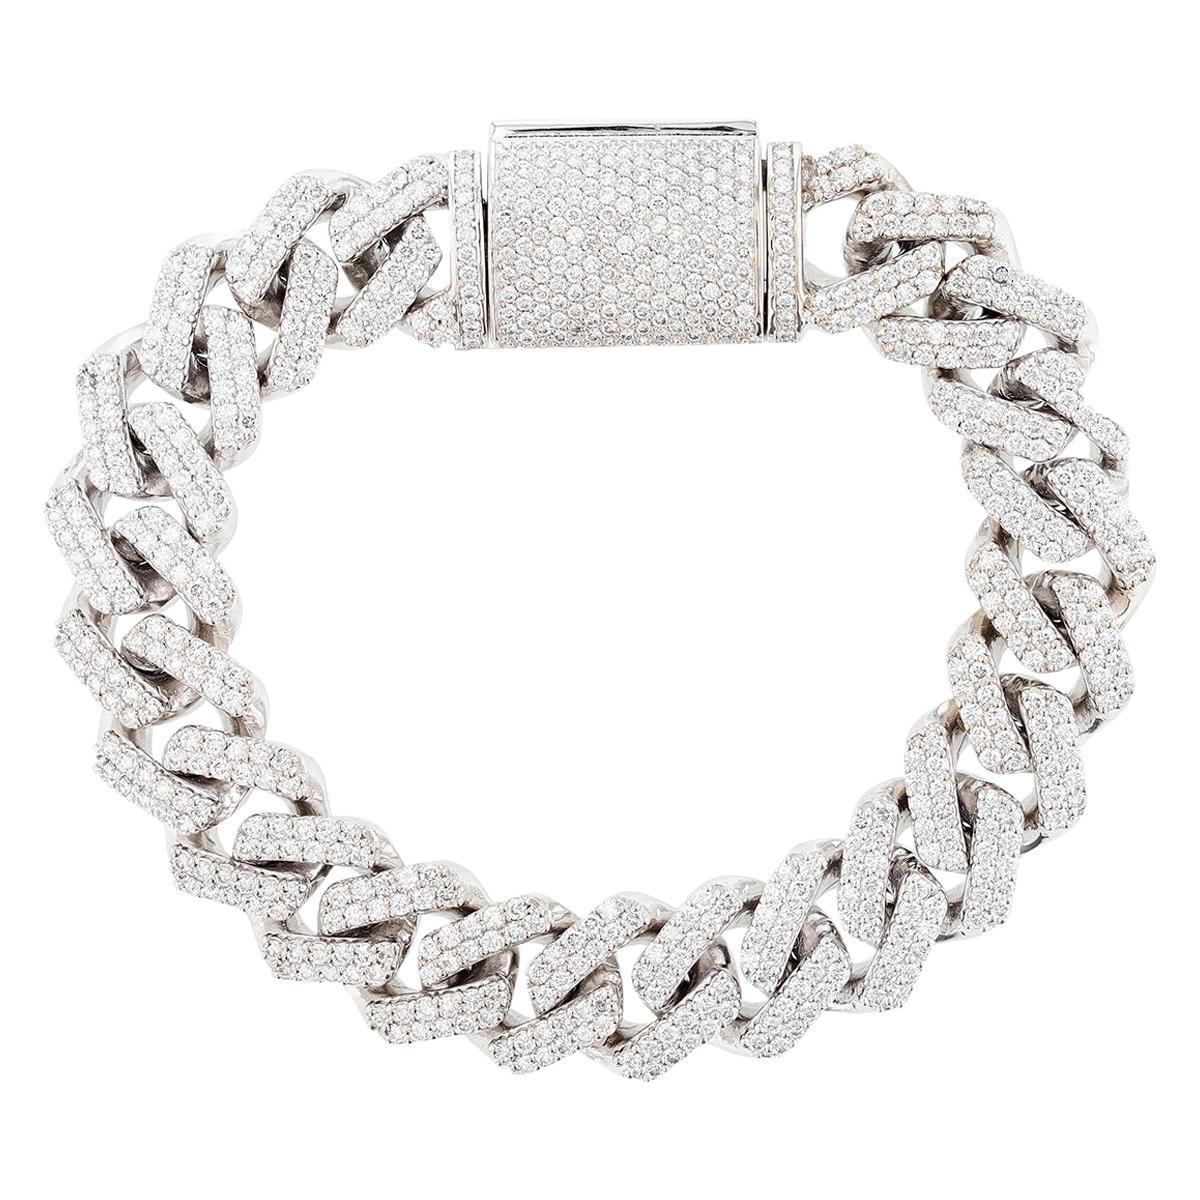 14 Karat White Gold 10.71 Carat Diamond Cuban Chain Link Bracelet